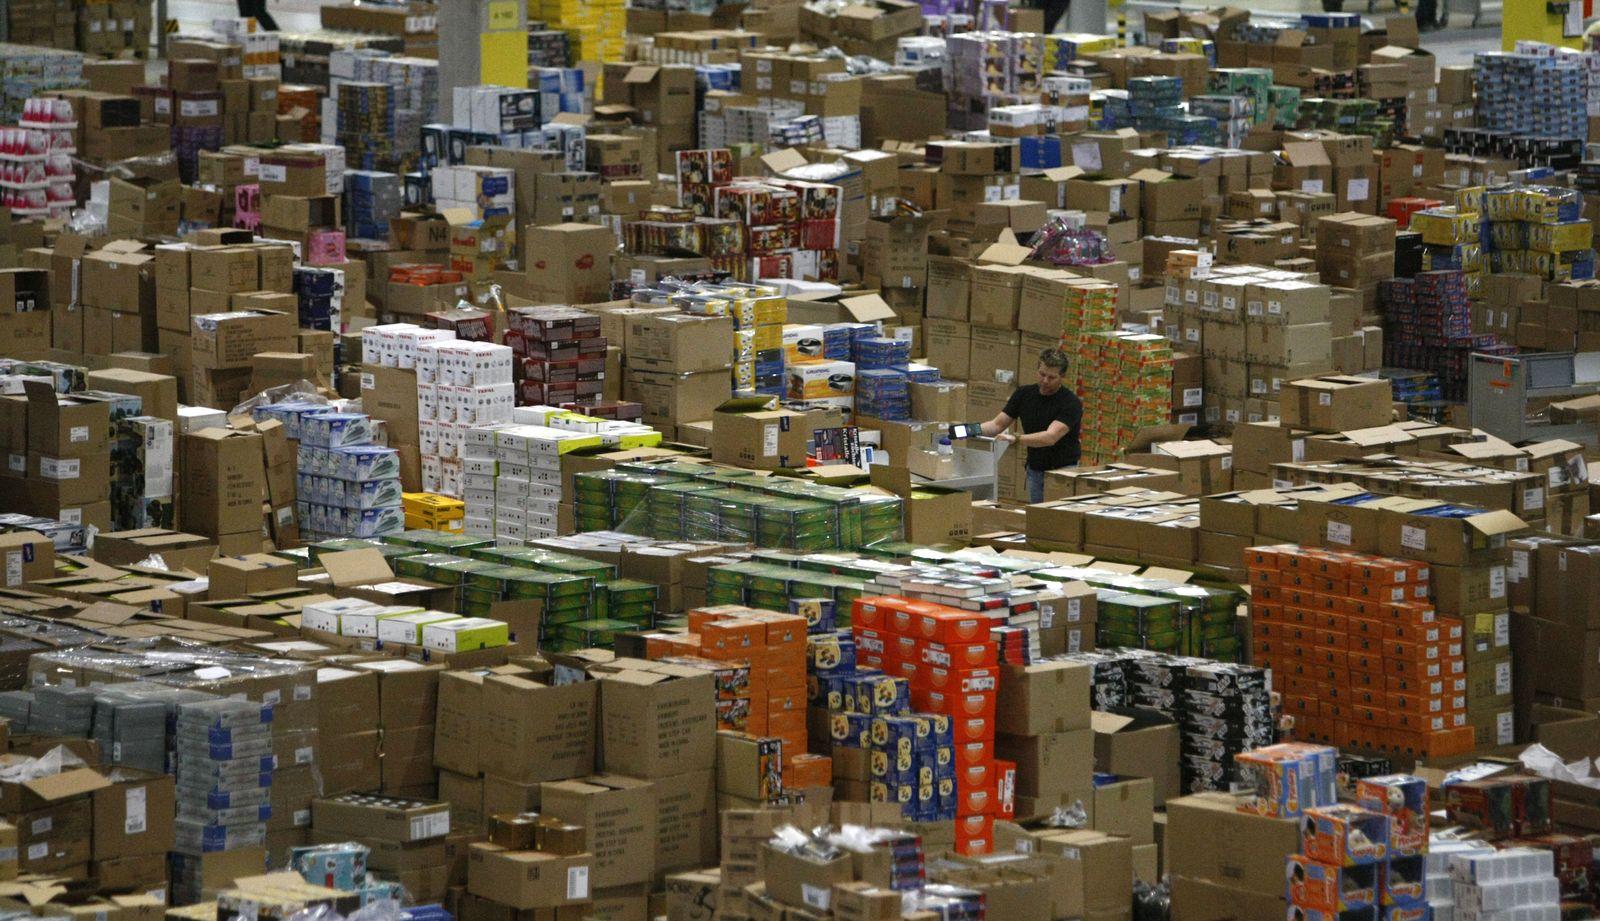 Amazon / Logistik / Logistikzentrum / Versandhandel